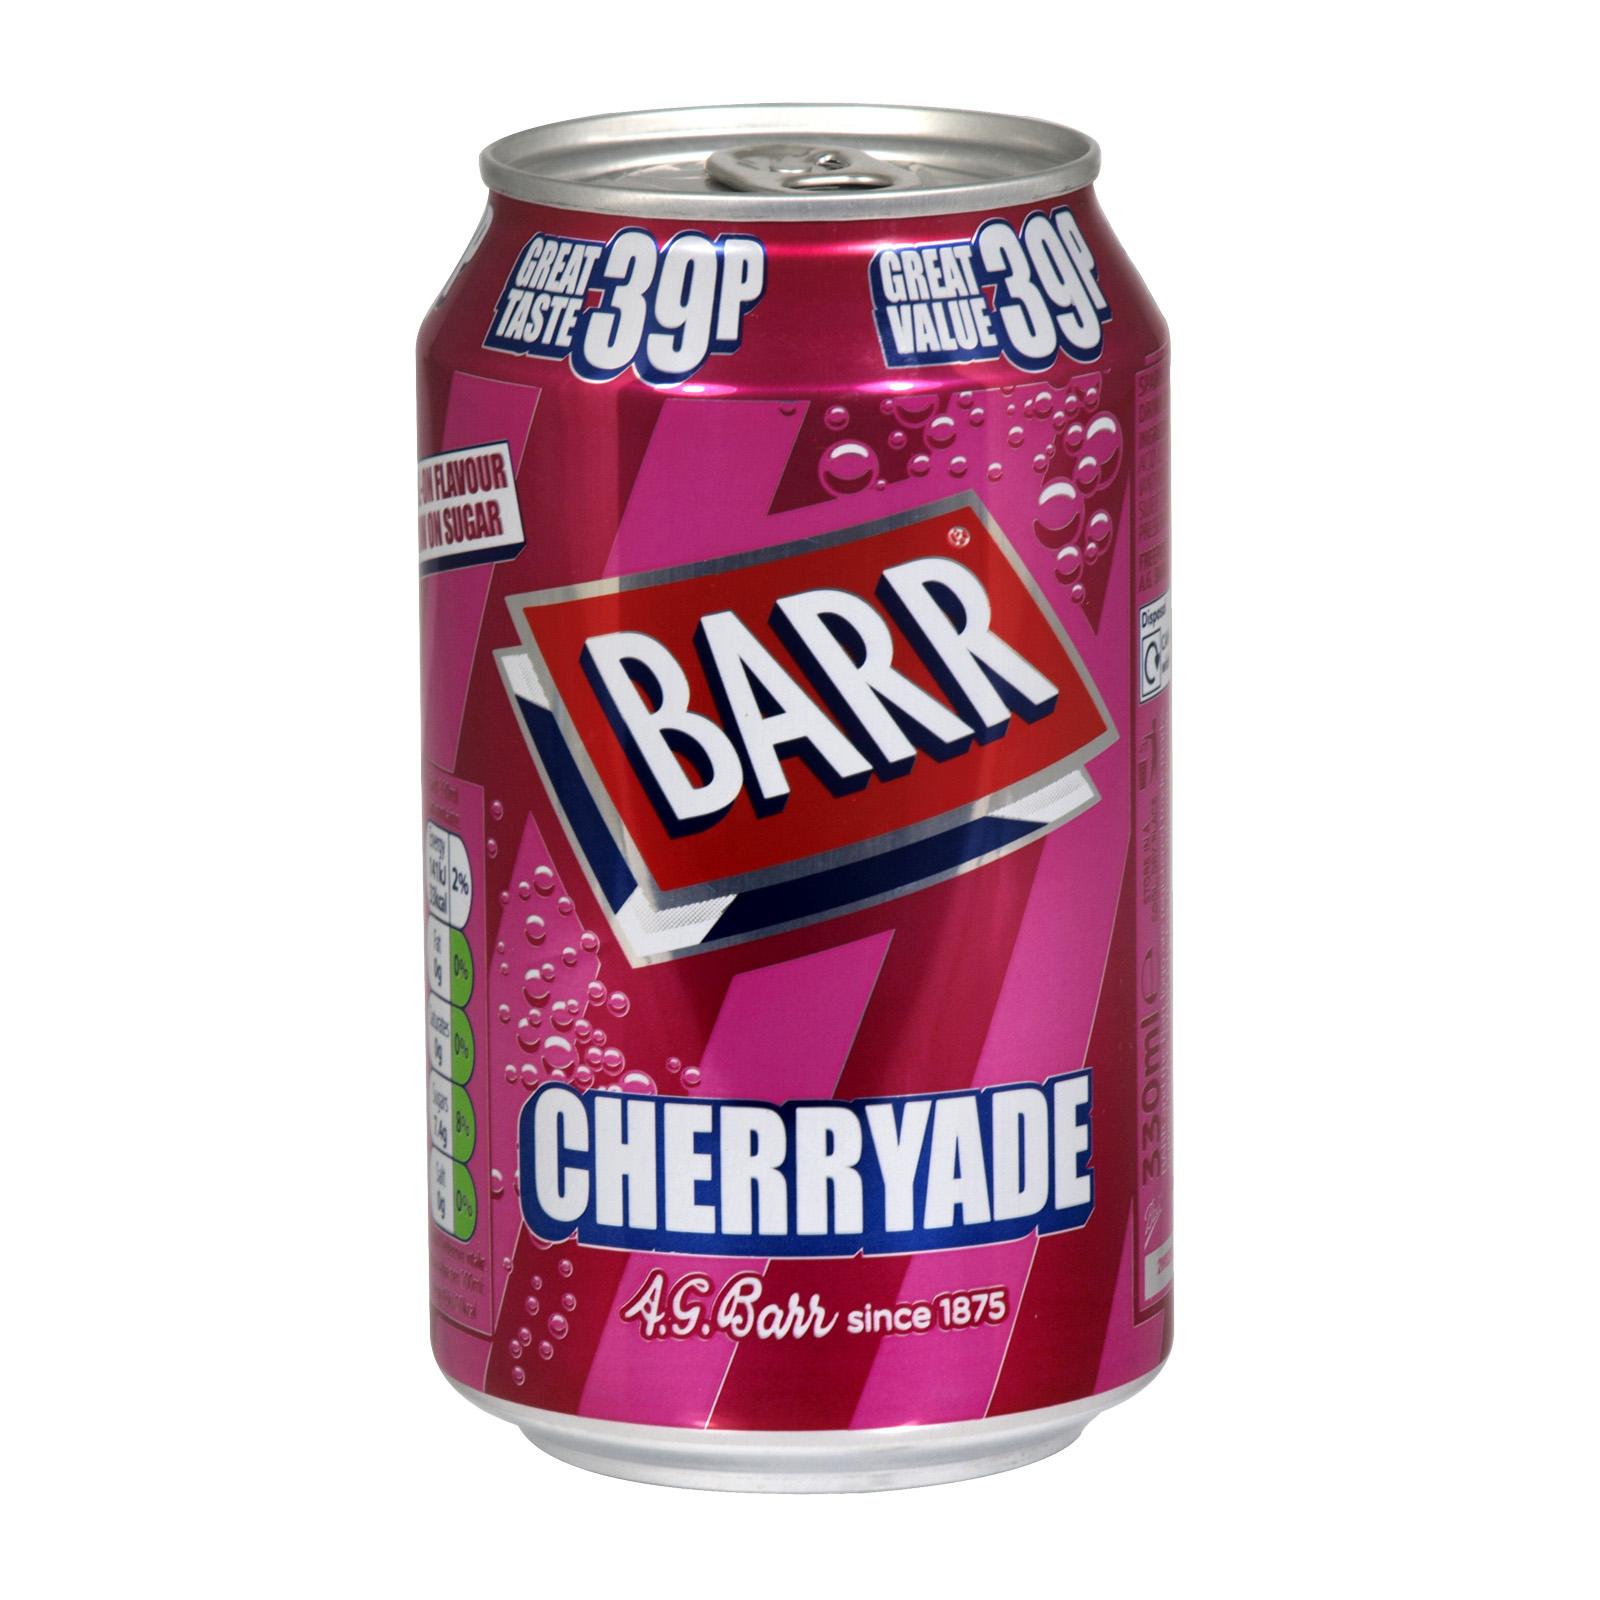 BARR 330ML CANS CHERRYADE PM 39P